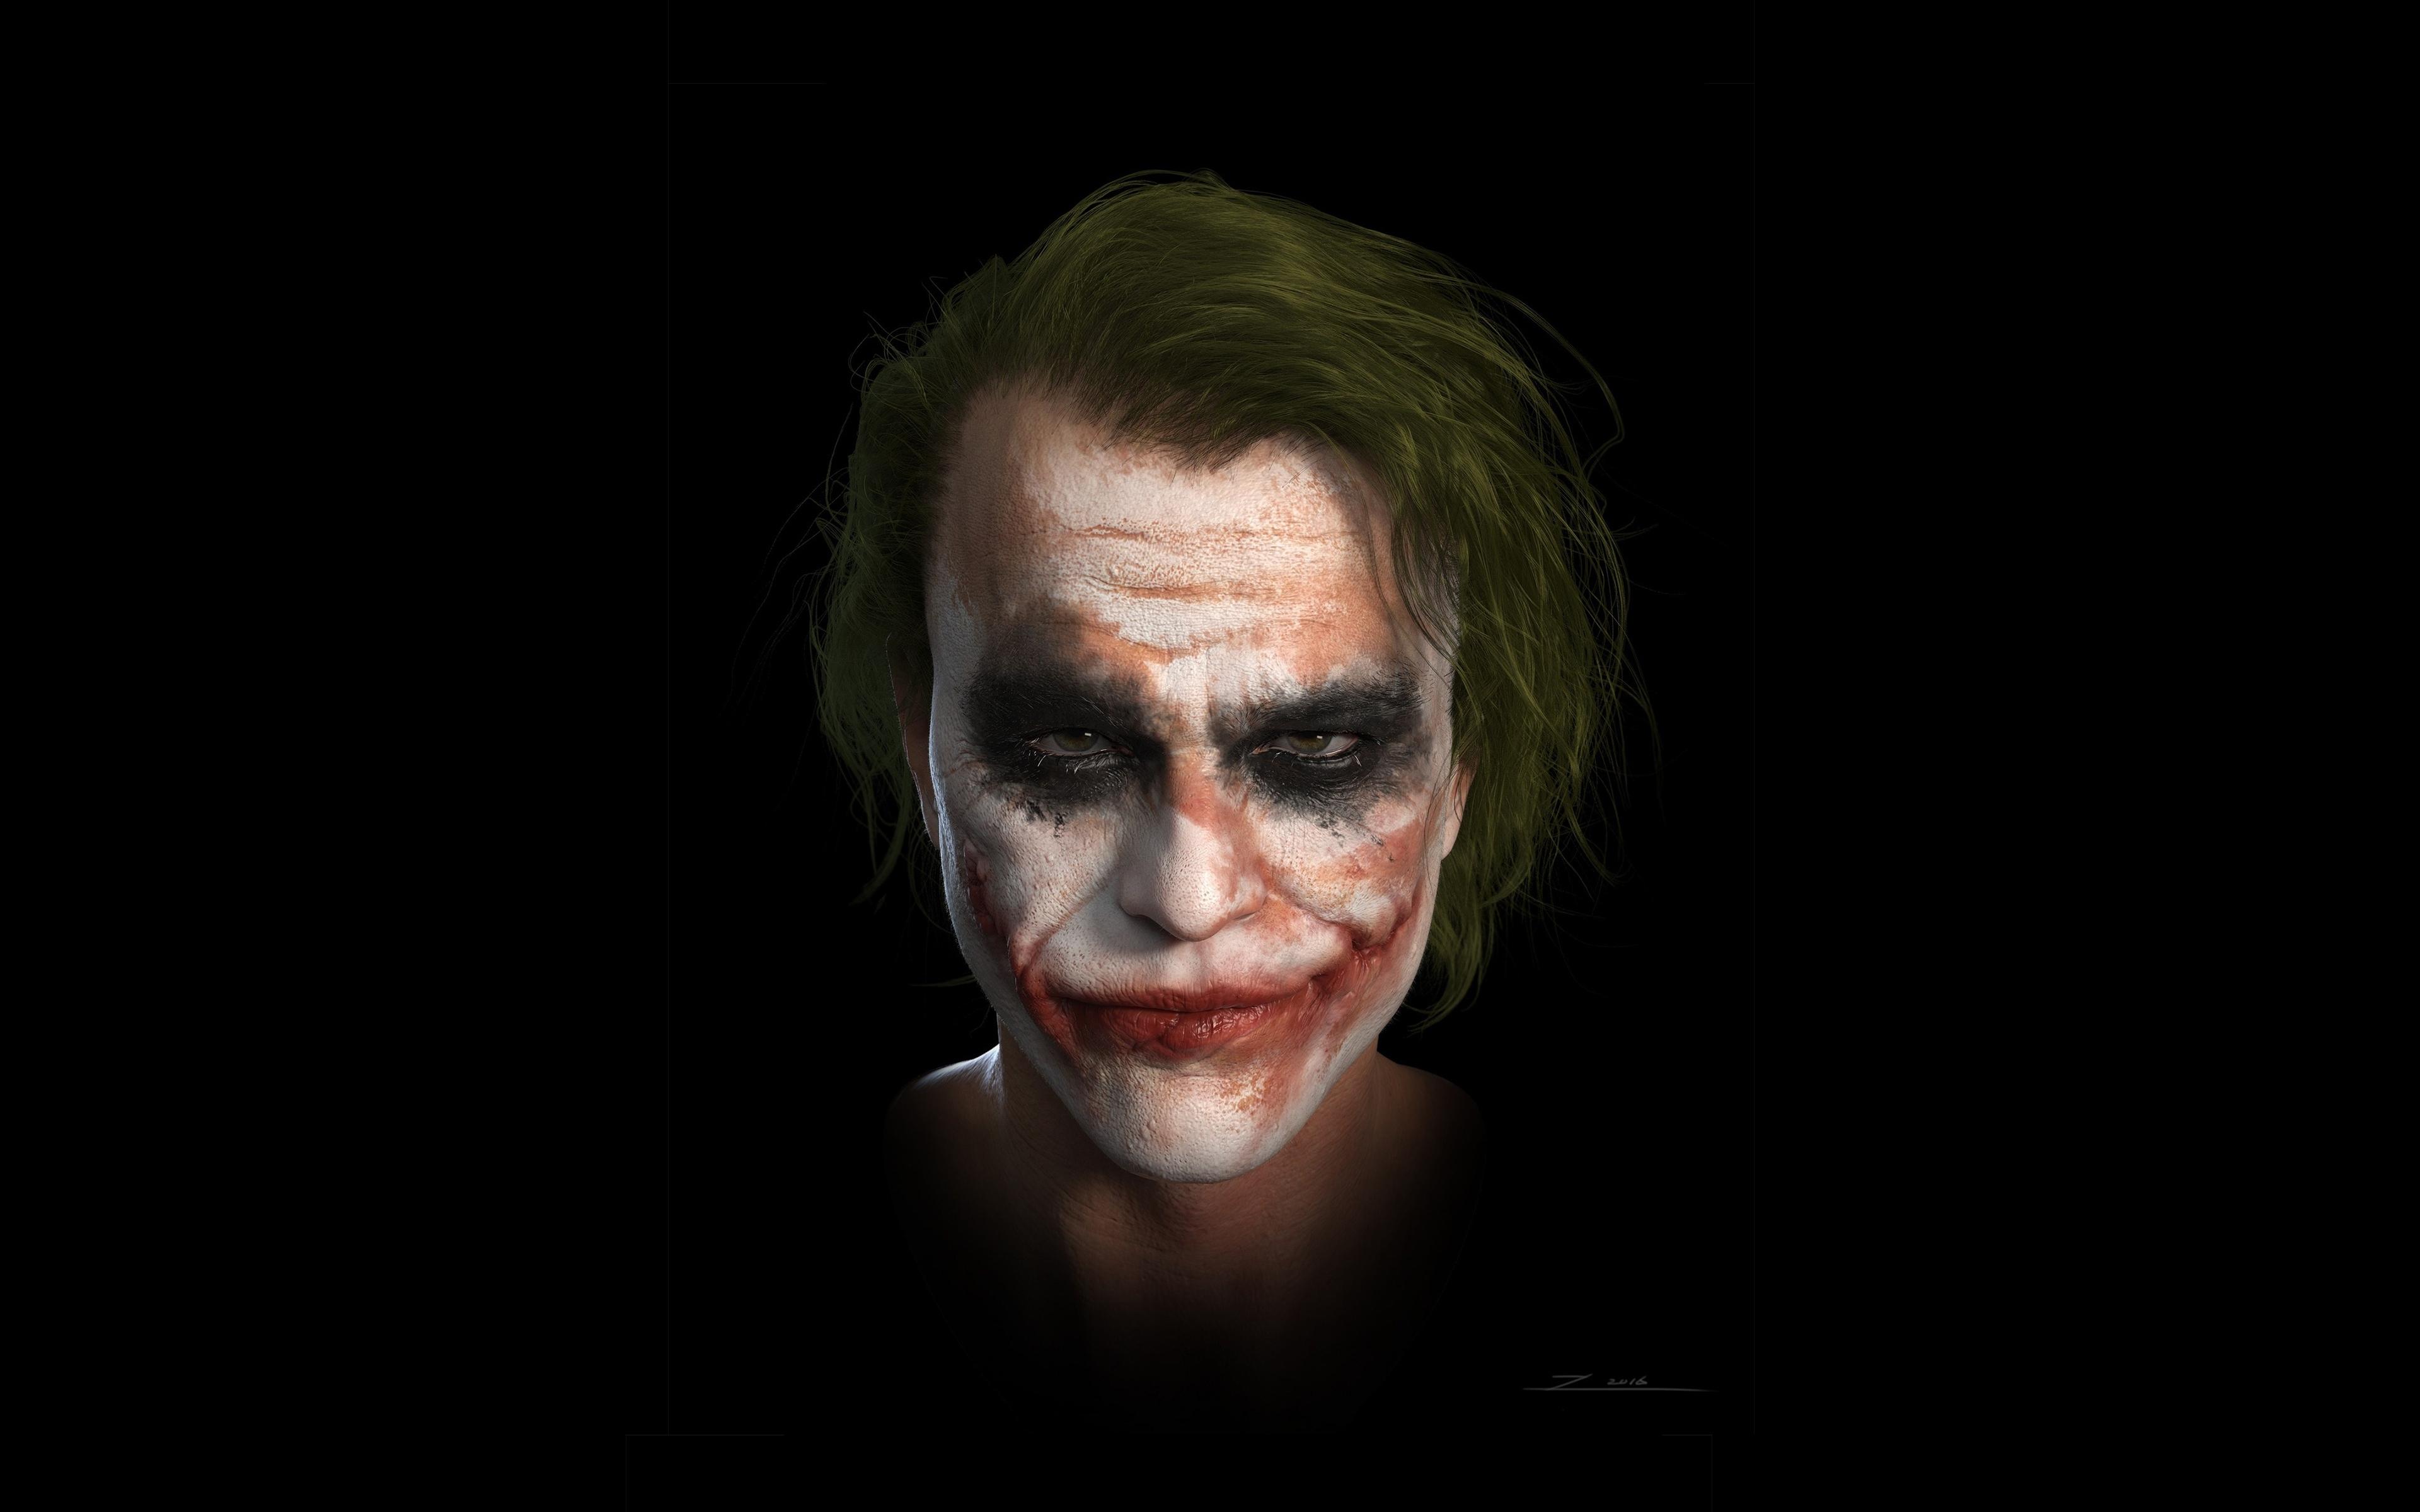 Download 3840x2400 Wallpaper Joker Heath Ledger Dc Studio